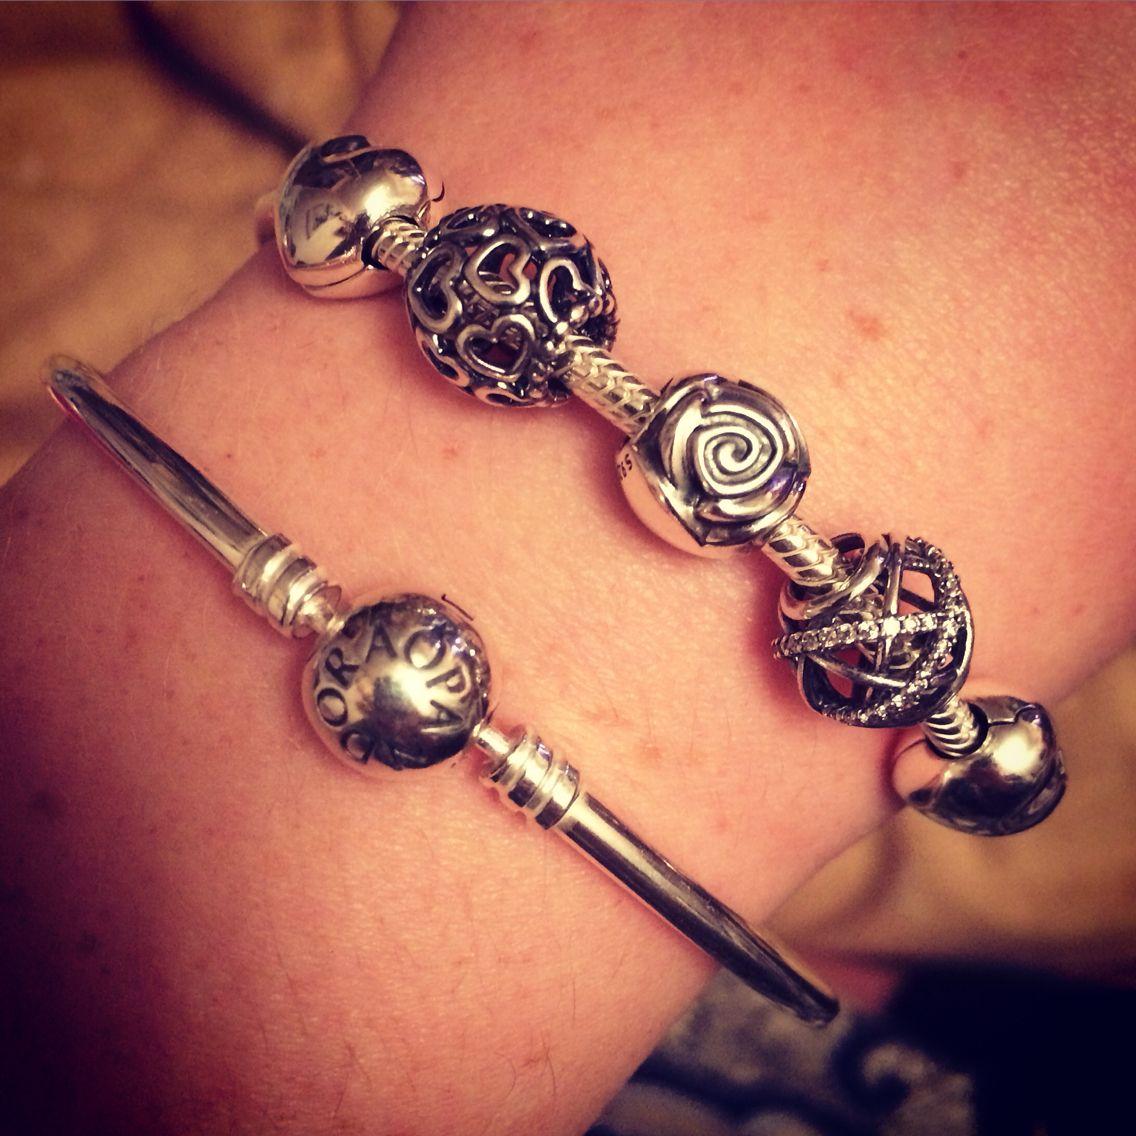 Pandora Bracelet & Bangle with heart, rose and sparkle charms